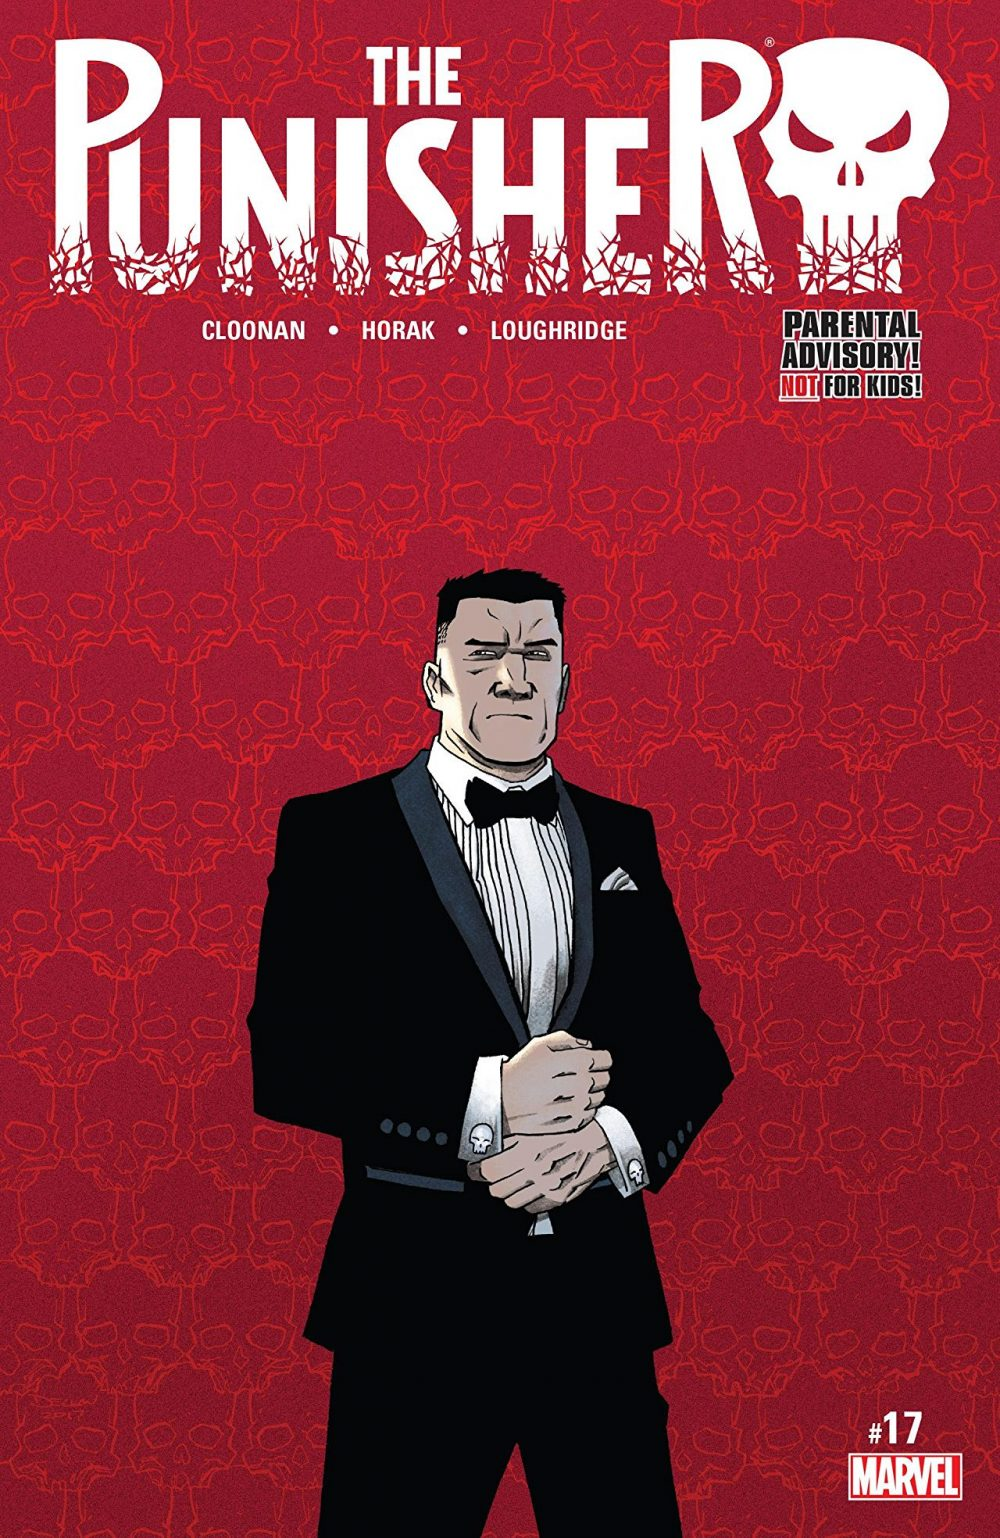 the punisher #17, copertina di declan shalvey